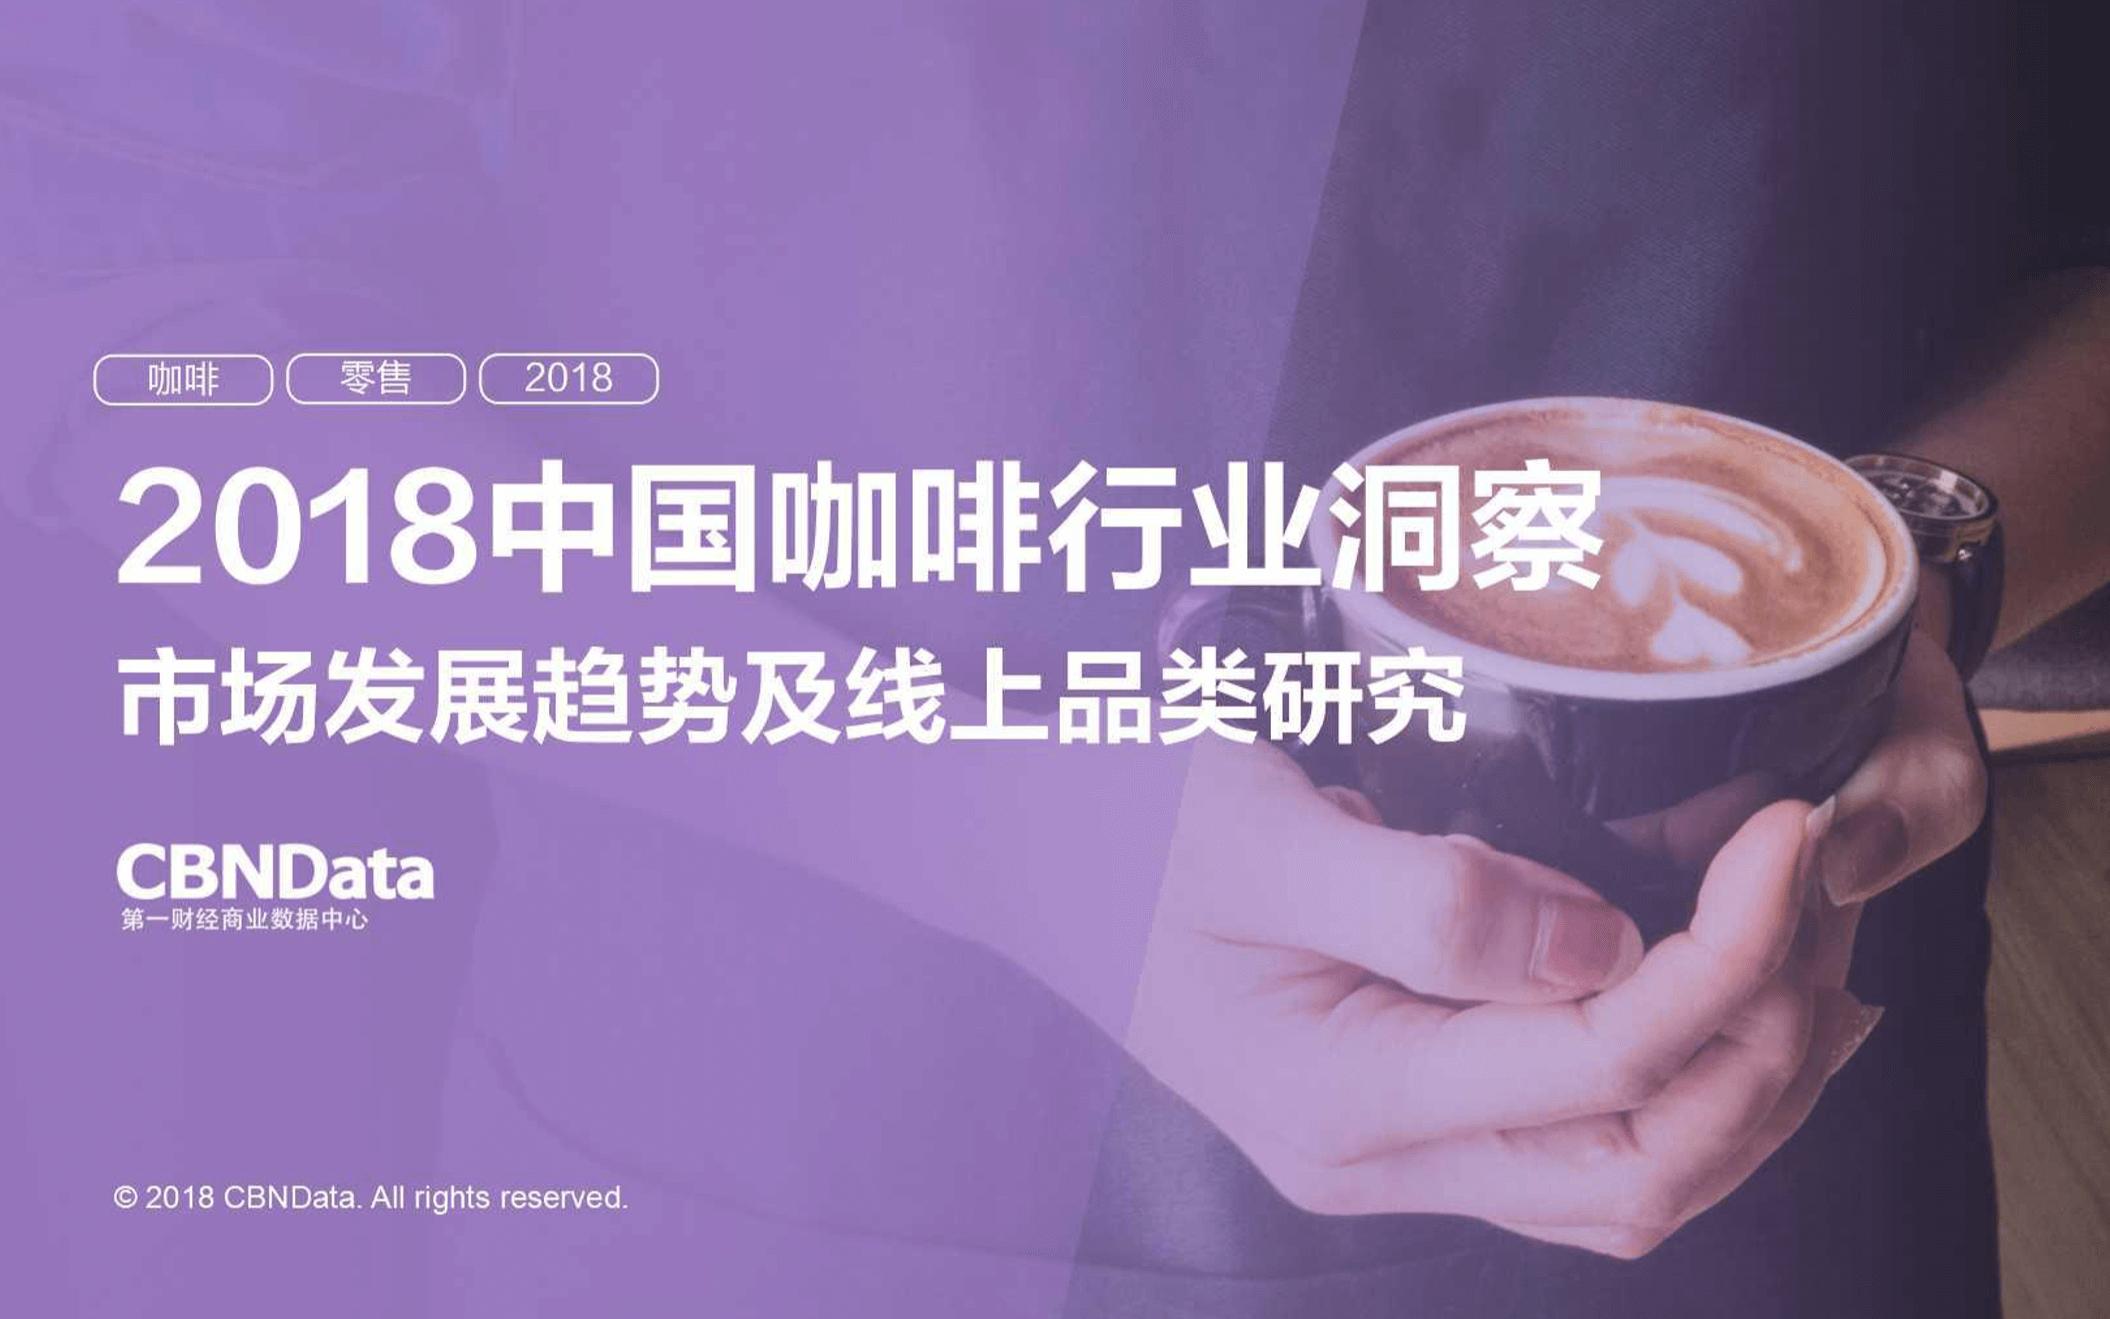 CBNData:2018 中国咖啡行业洞察